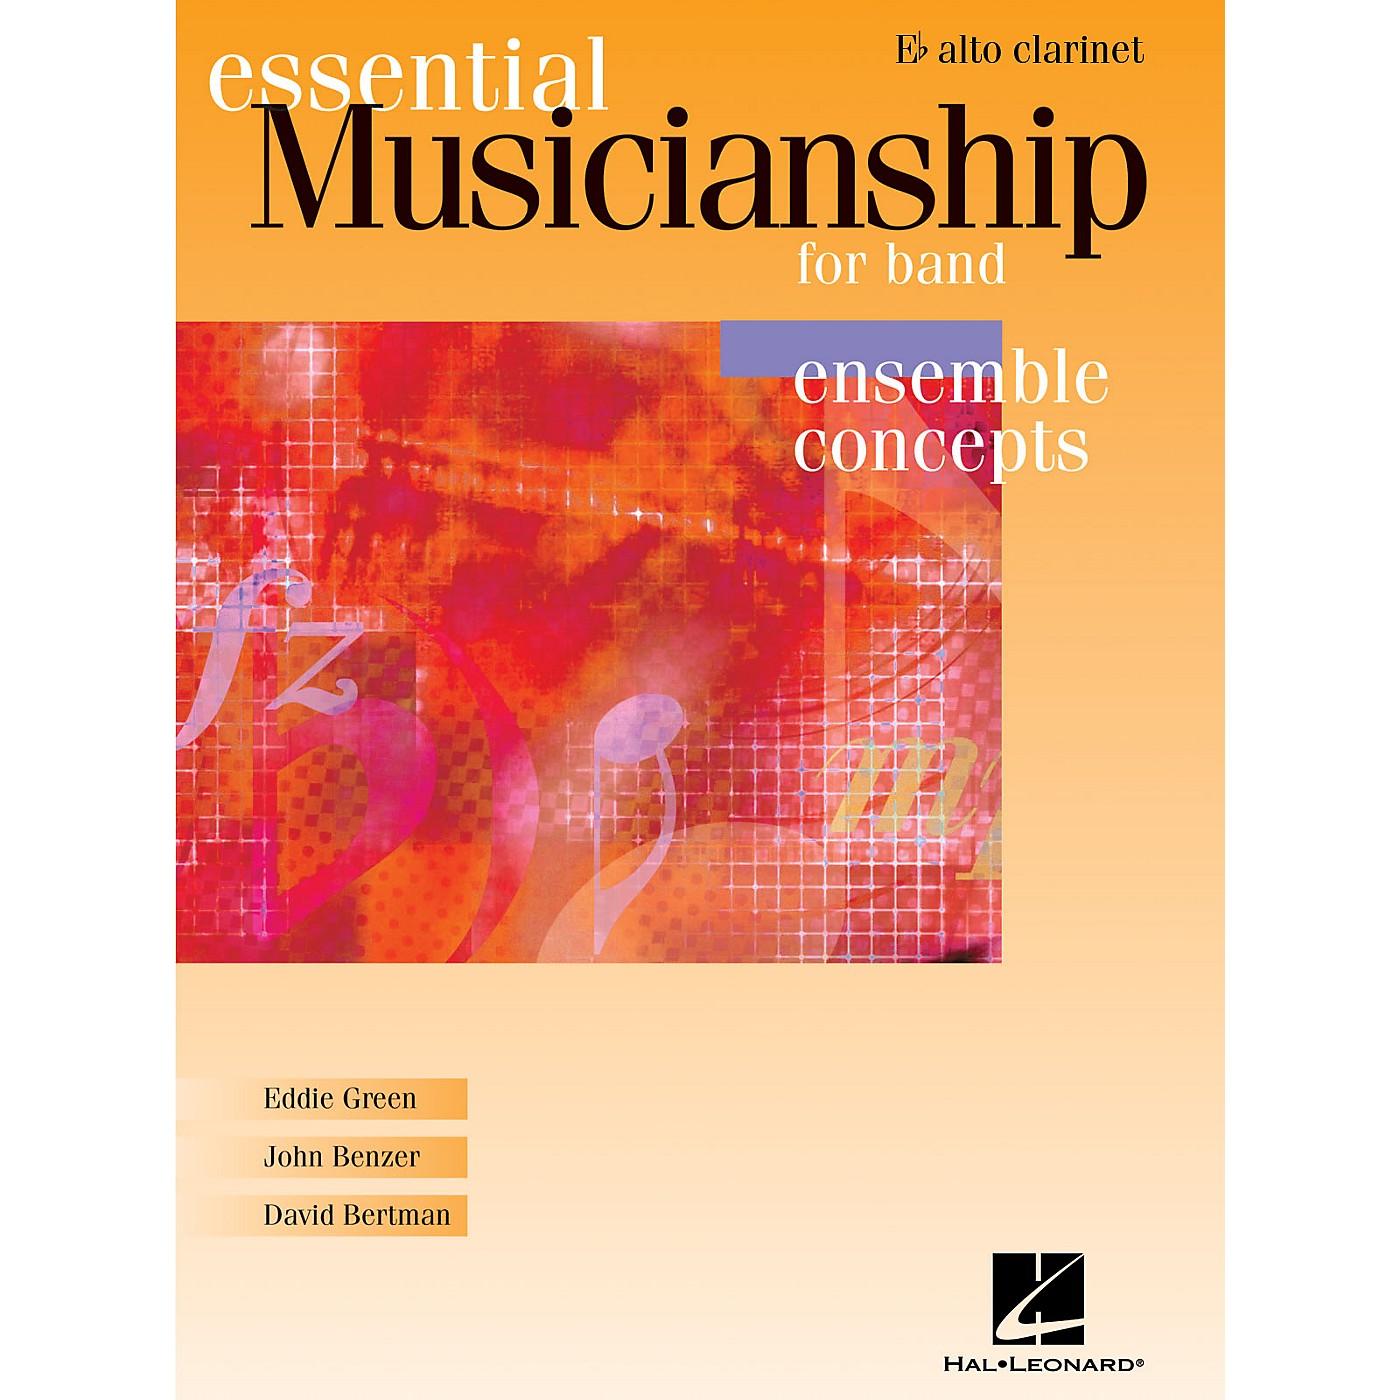 Hal Leonard Essential Musicianship for Band - Ensemble Concepts (Eb Alto Clarinet) Concert Band thumbnail